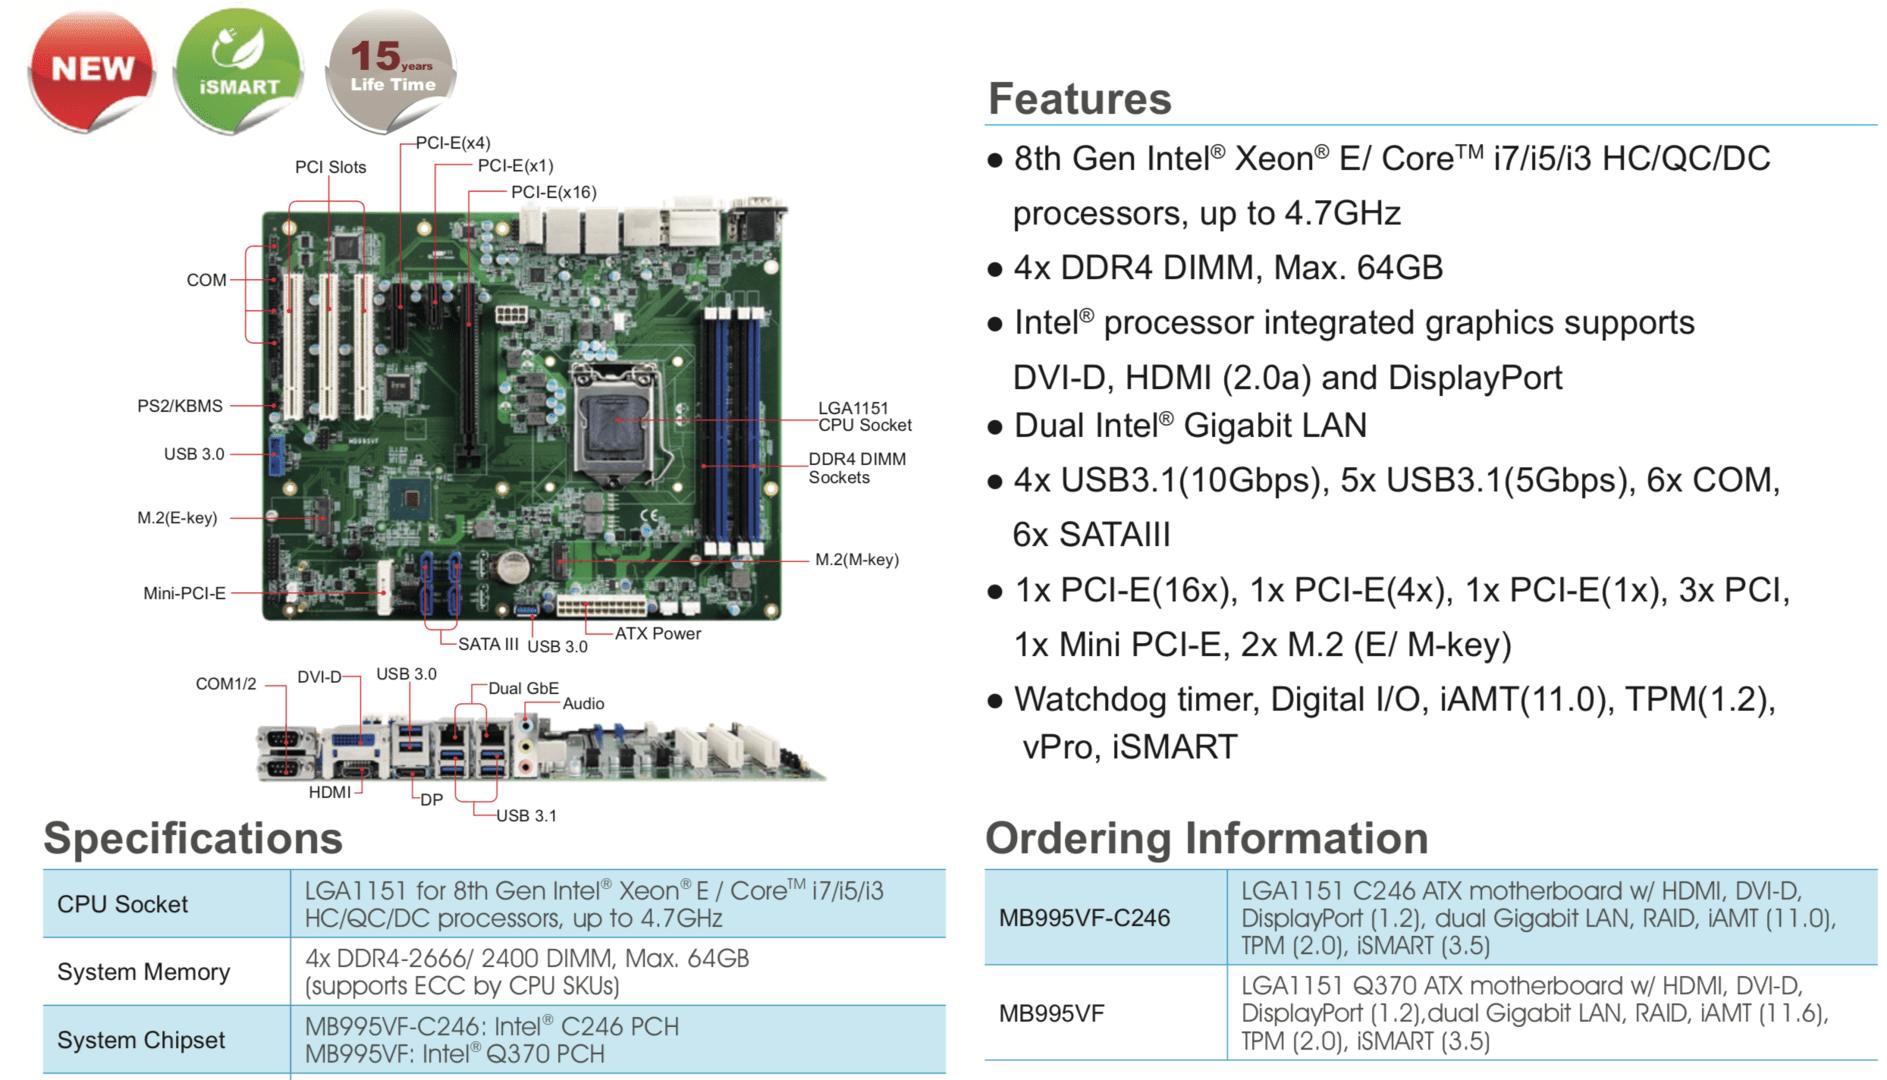 LGA-Mainboard für sockelbare Intel Xeon E